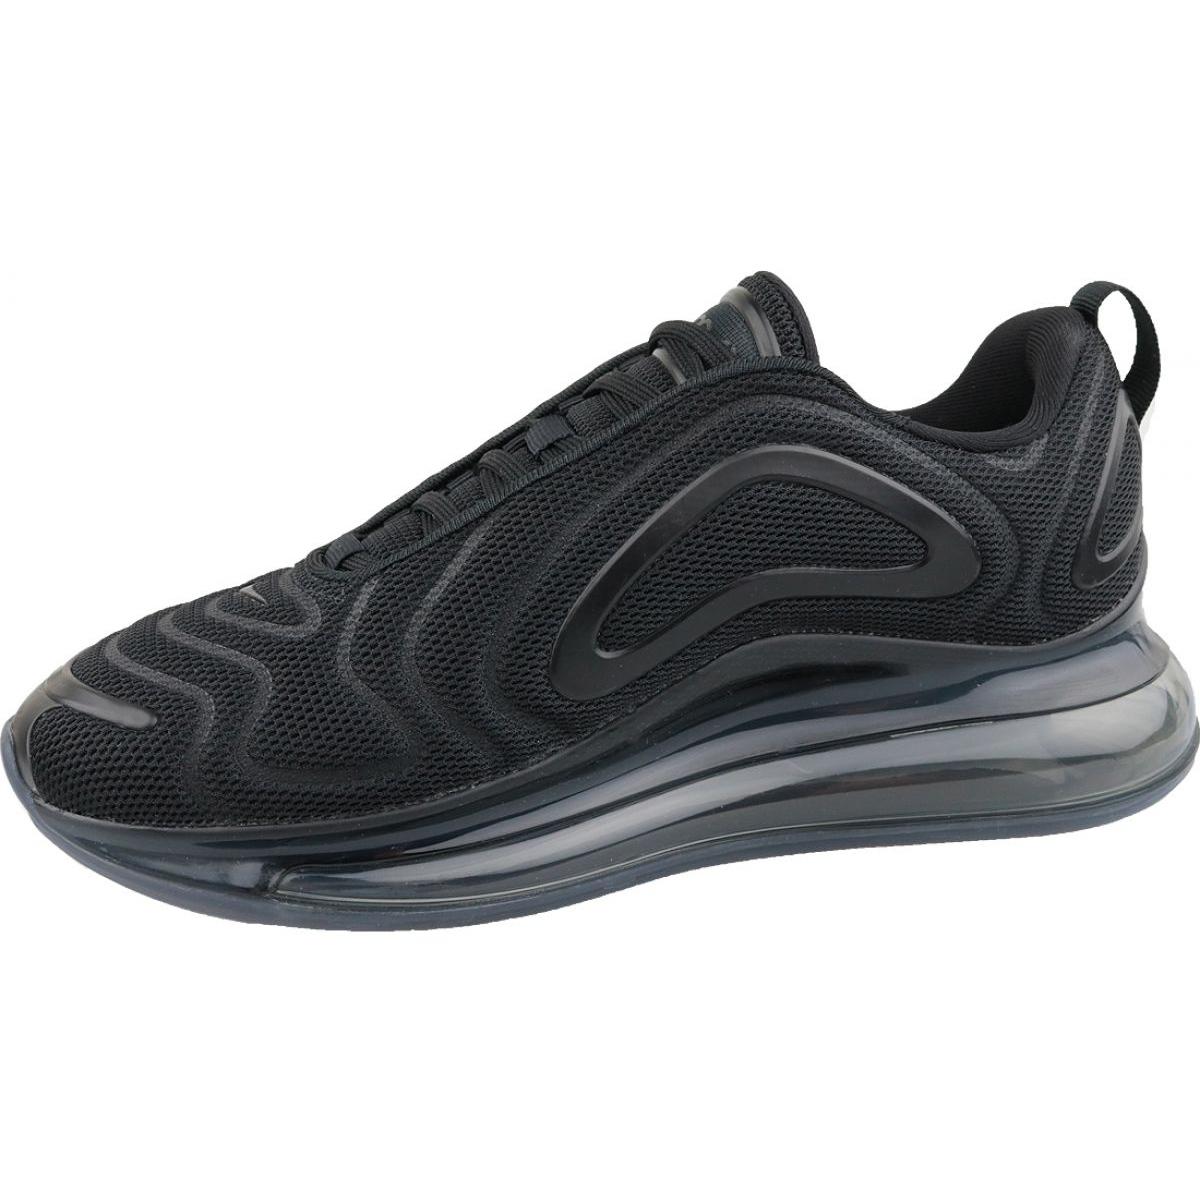 Negro Zapatos Nike Air Max 720 W AR9293 006